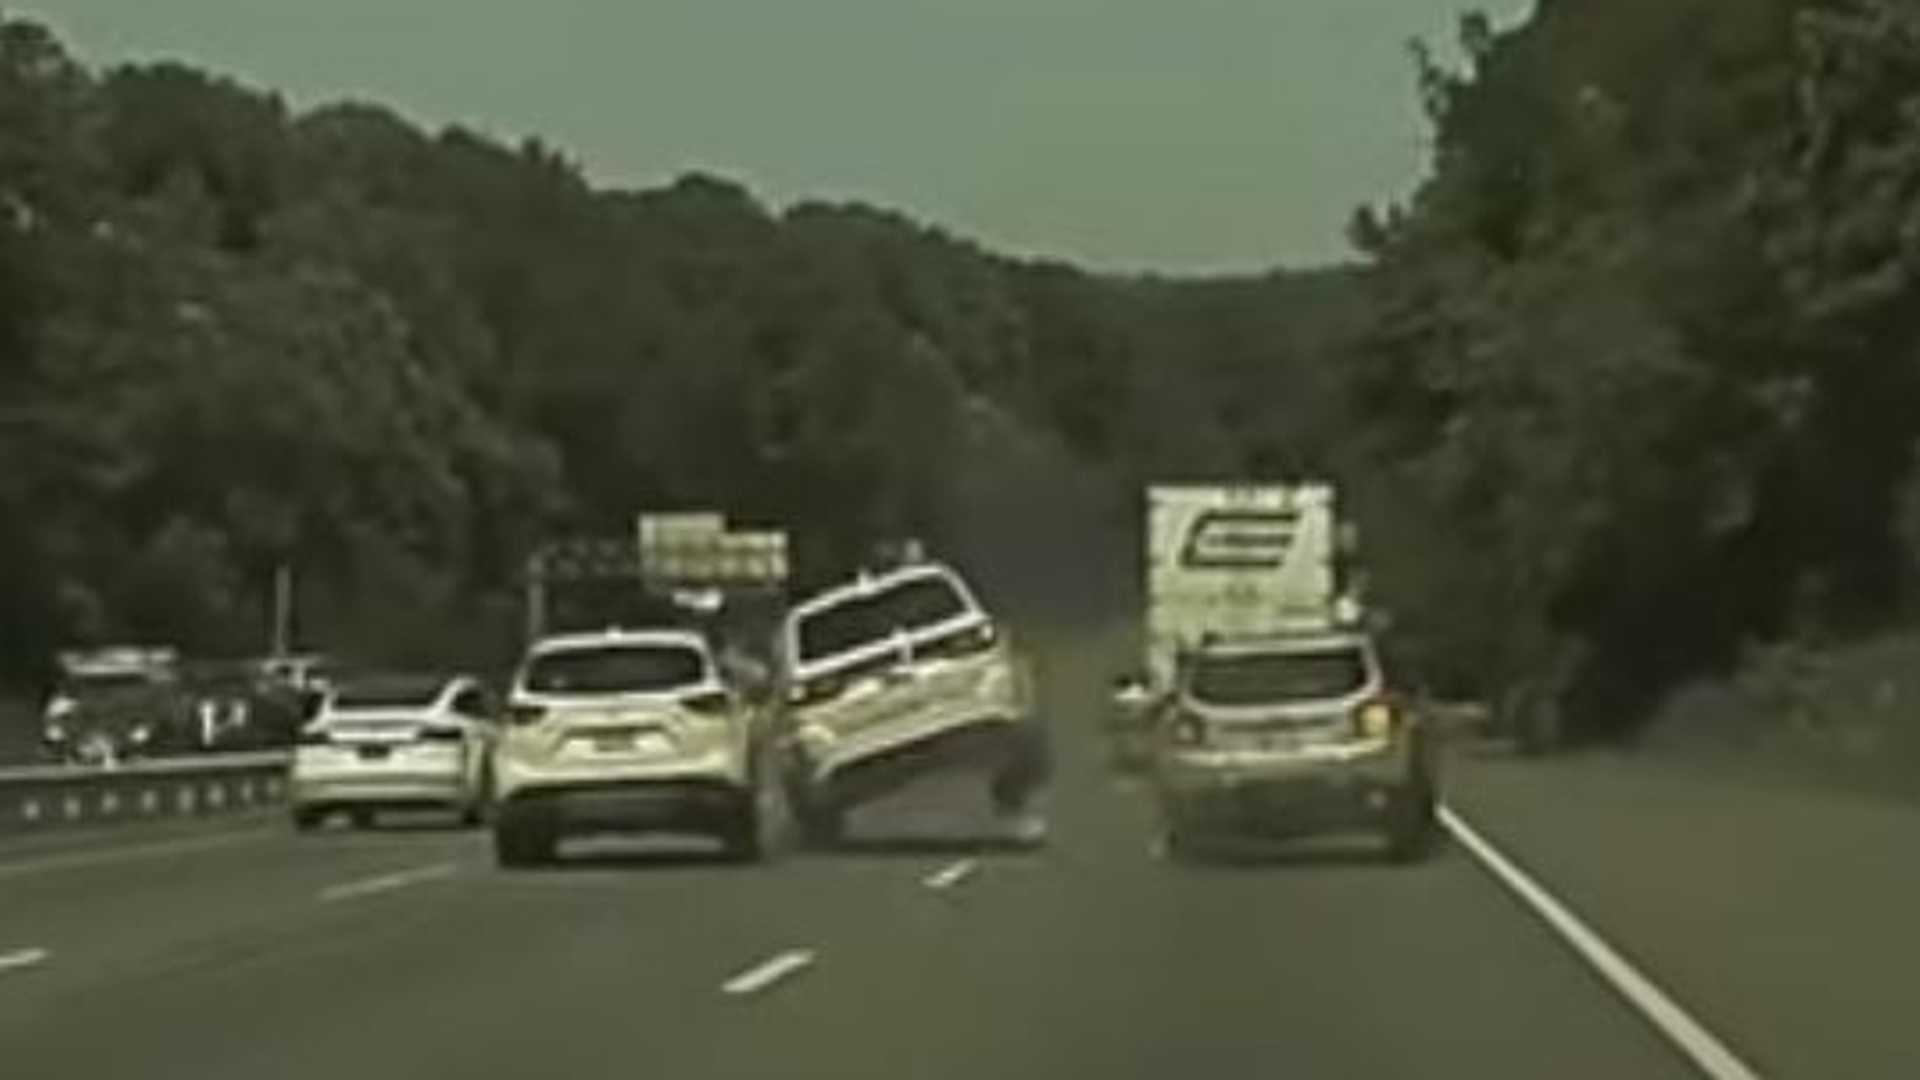 Merging Gone Wrong: Dodge Durango Flies By Tesla Model 3 Then Crashes